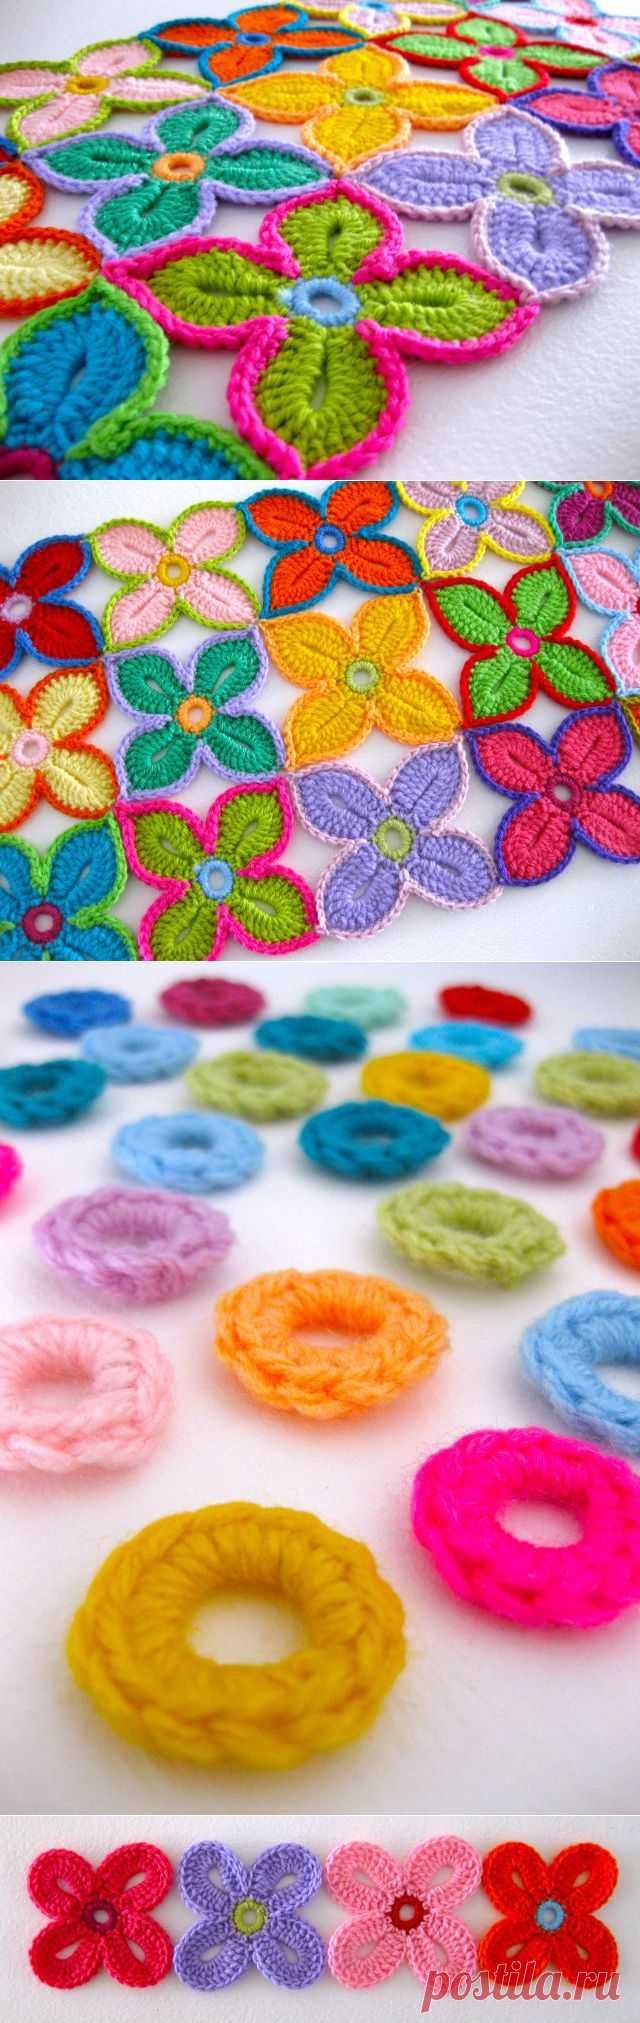 Гавайский цветок крючком: мастер-класс | Мои Петельки